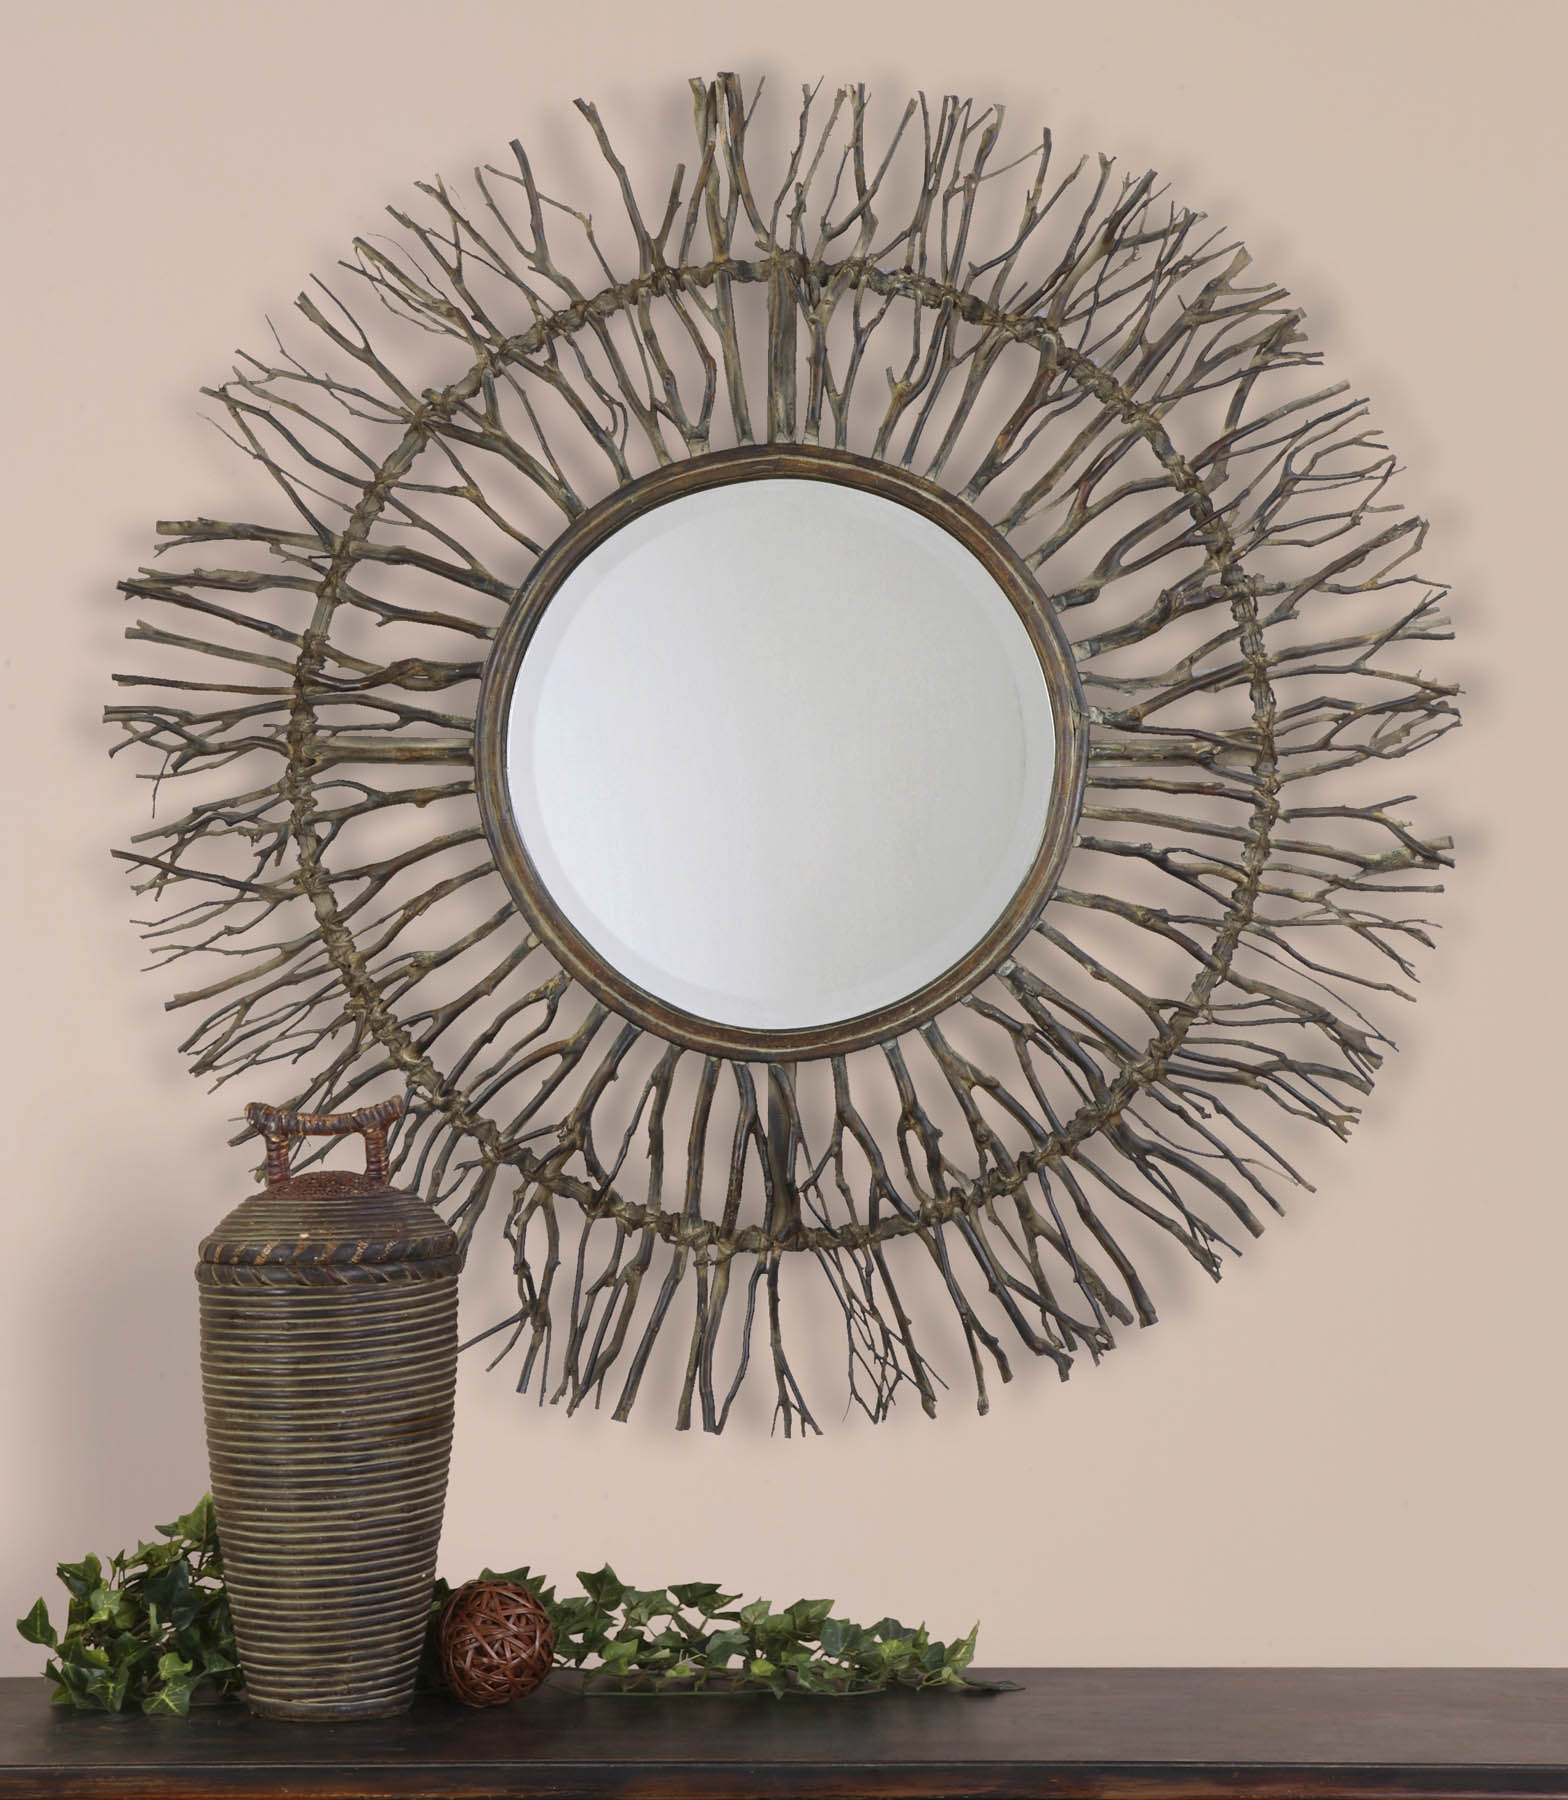 Vivian Wall Mirror By Uttermost: Josiah Contemporary Round Wall Mirror By Uttermost